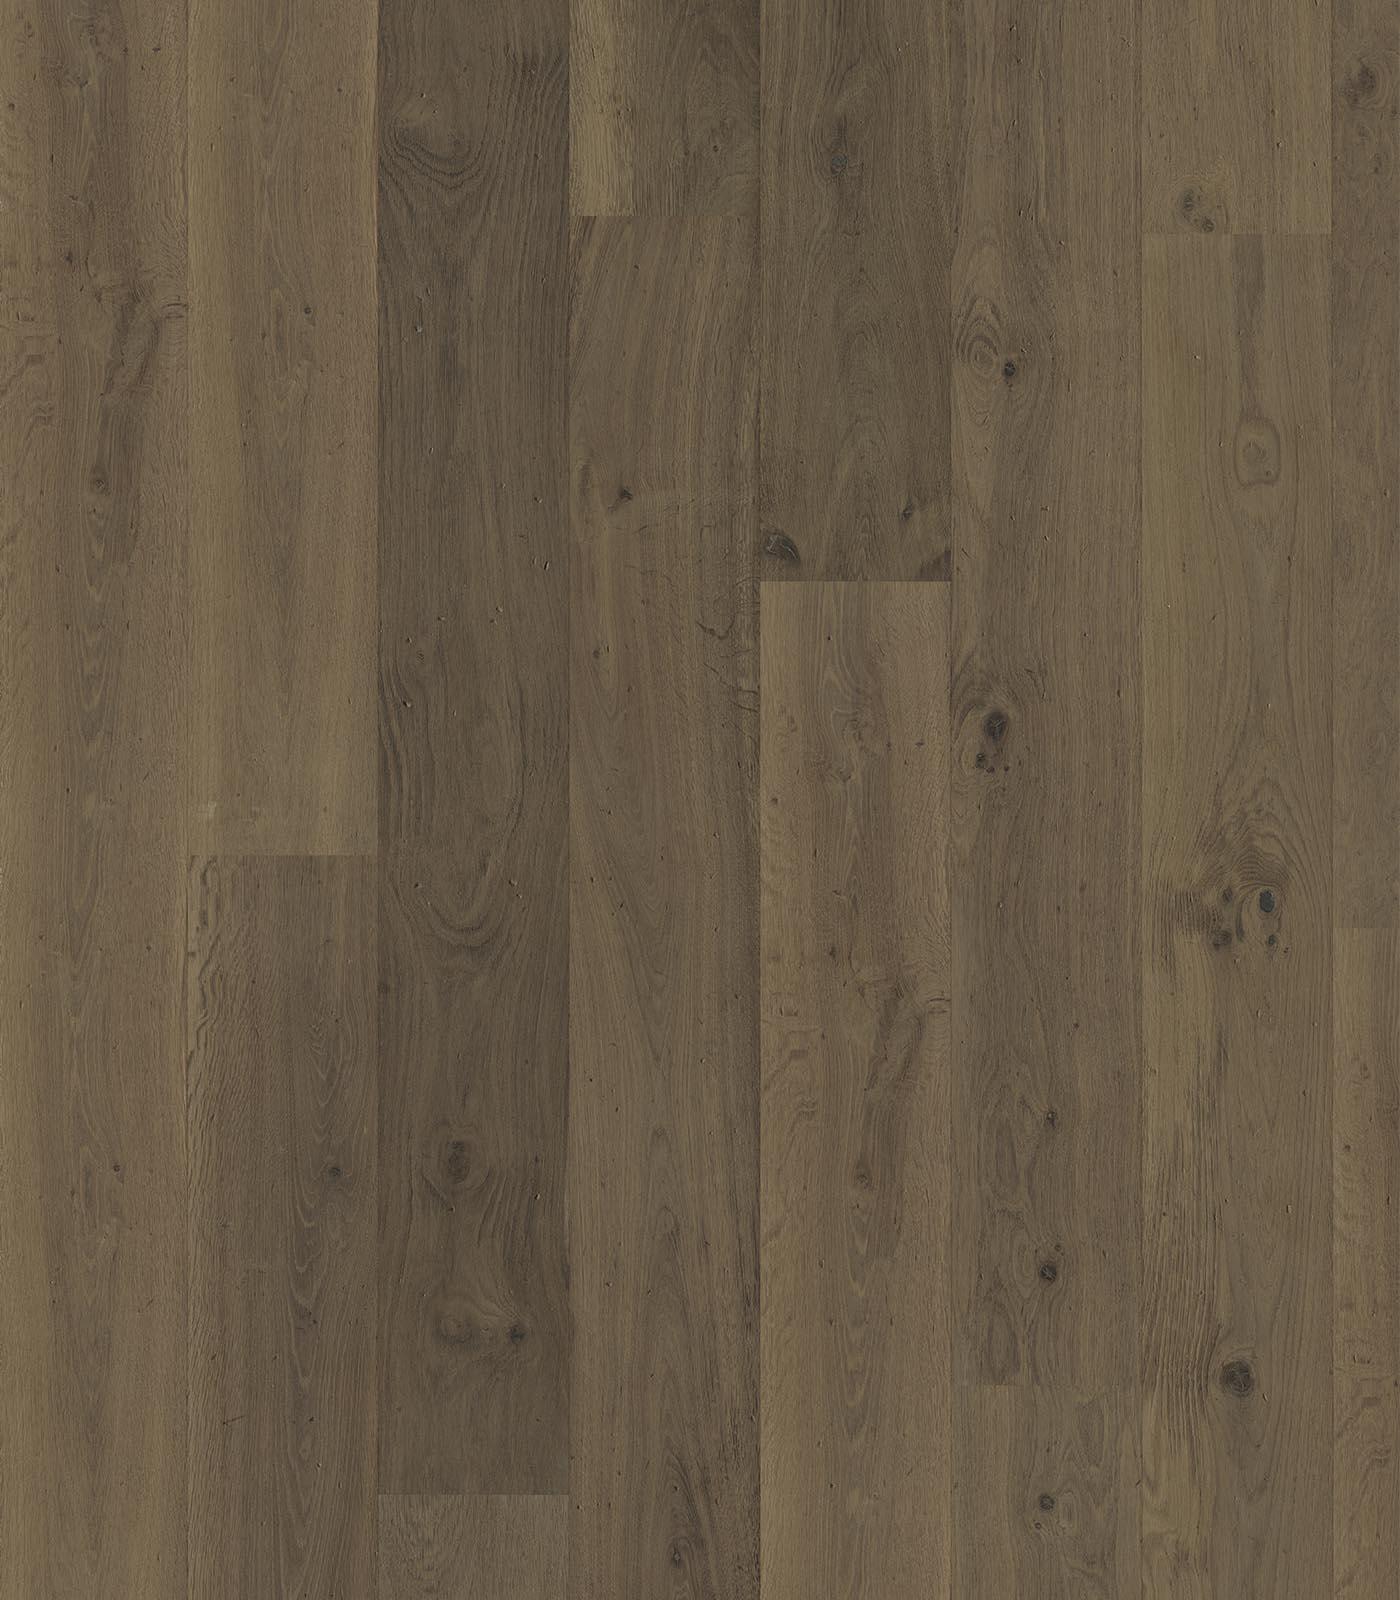 Verona-European Oak flooring-Heritage Collection-flat